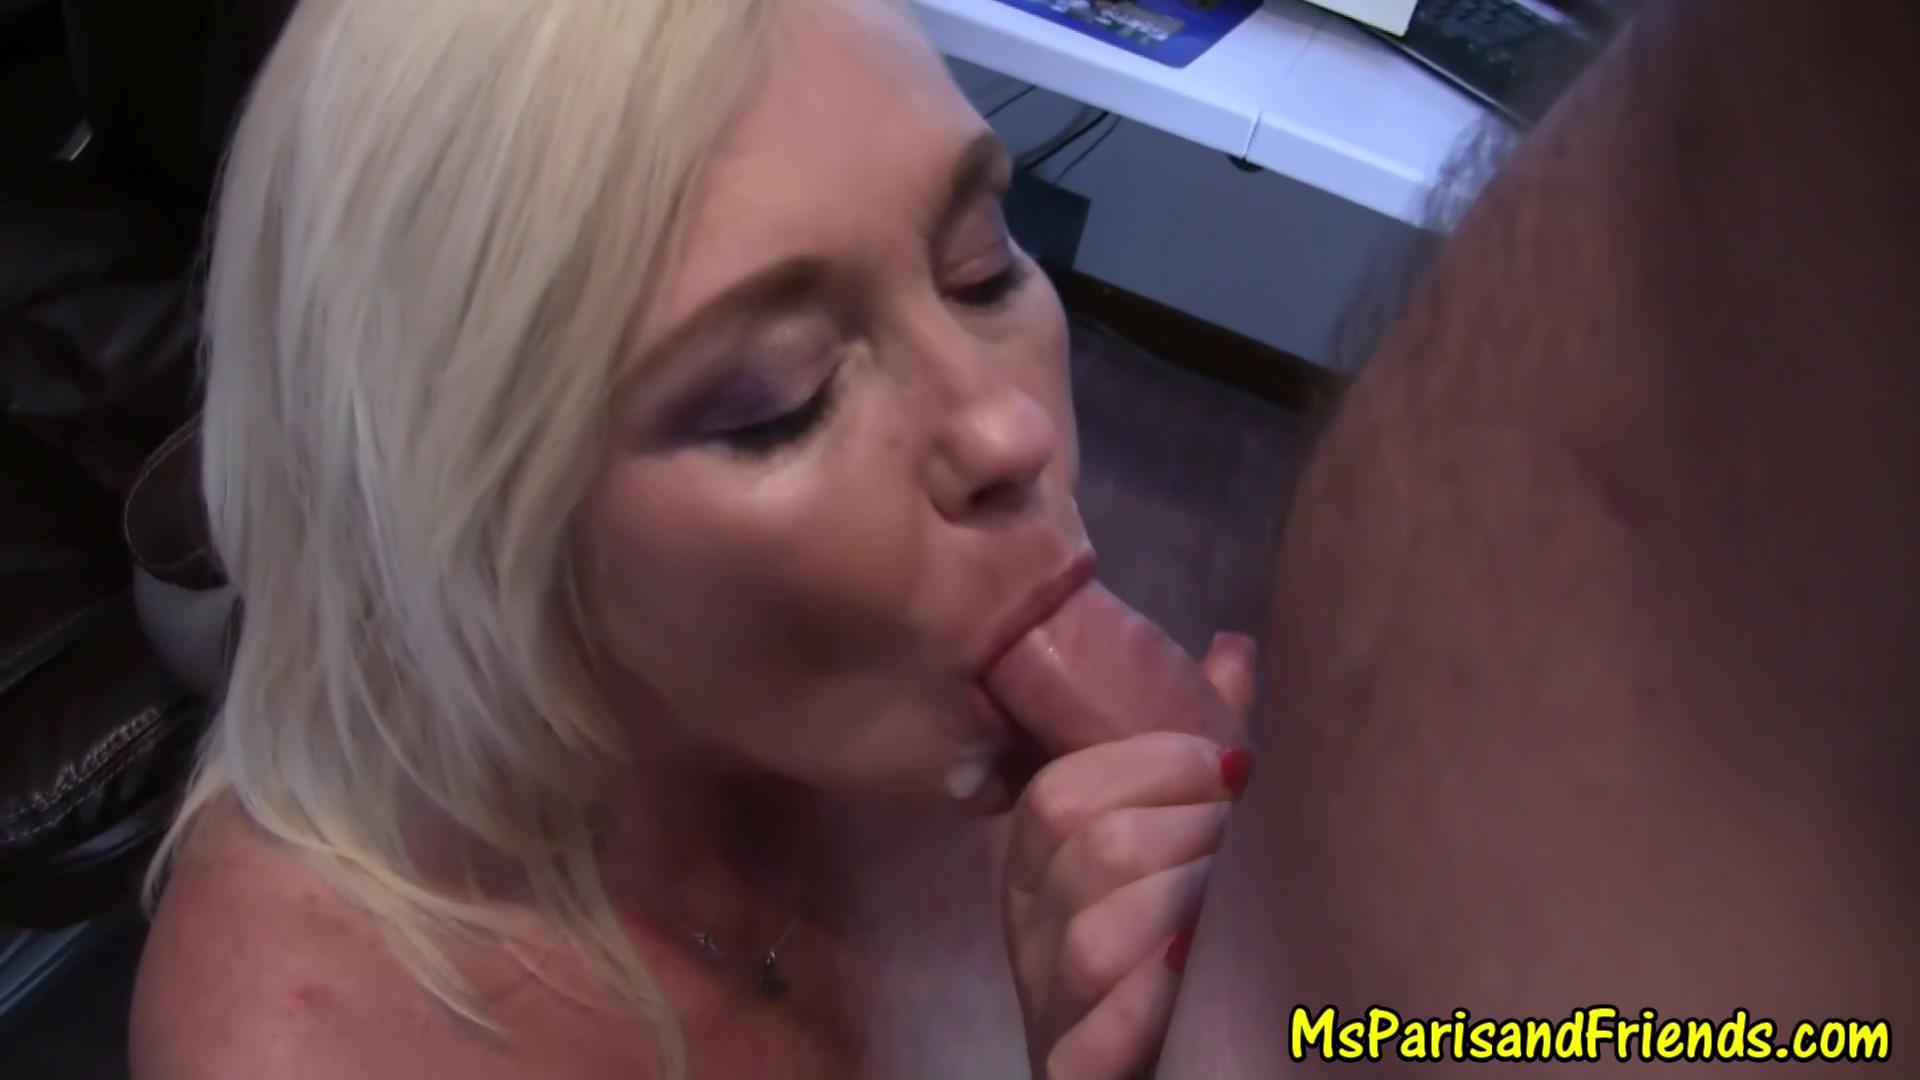 Video 1557498704: milf handjob cumshot compilation, milf facial compilation, compilation blonde milf, compilation milf hd, cunnilingus compilation, brunette cumshot compilation, fucking